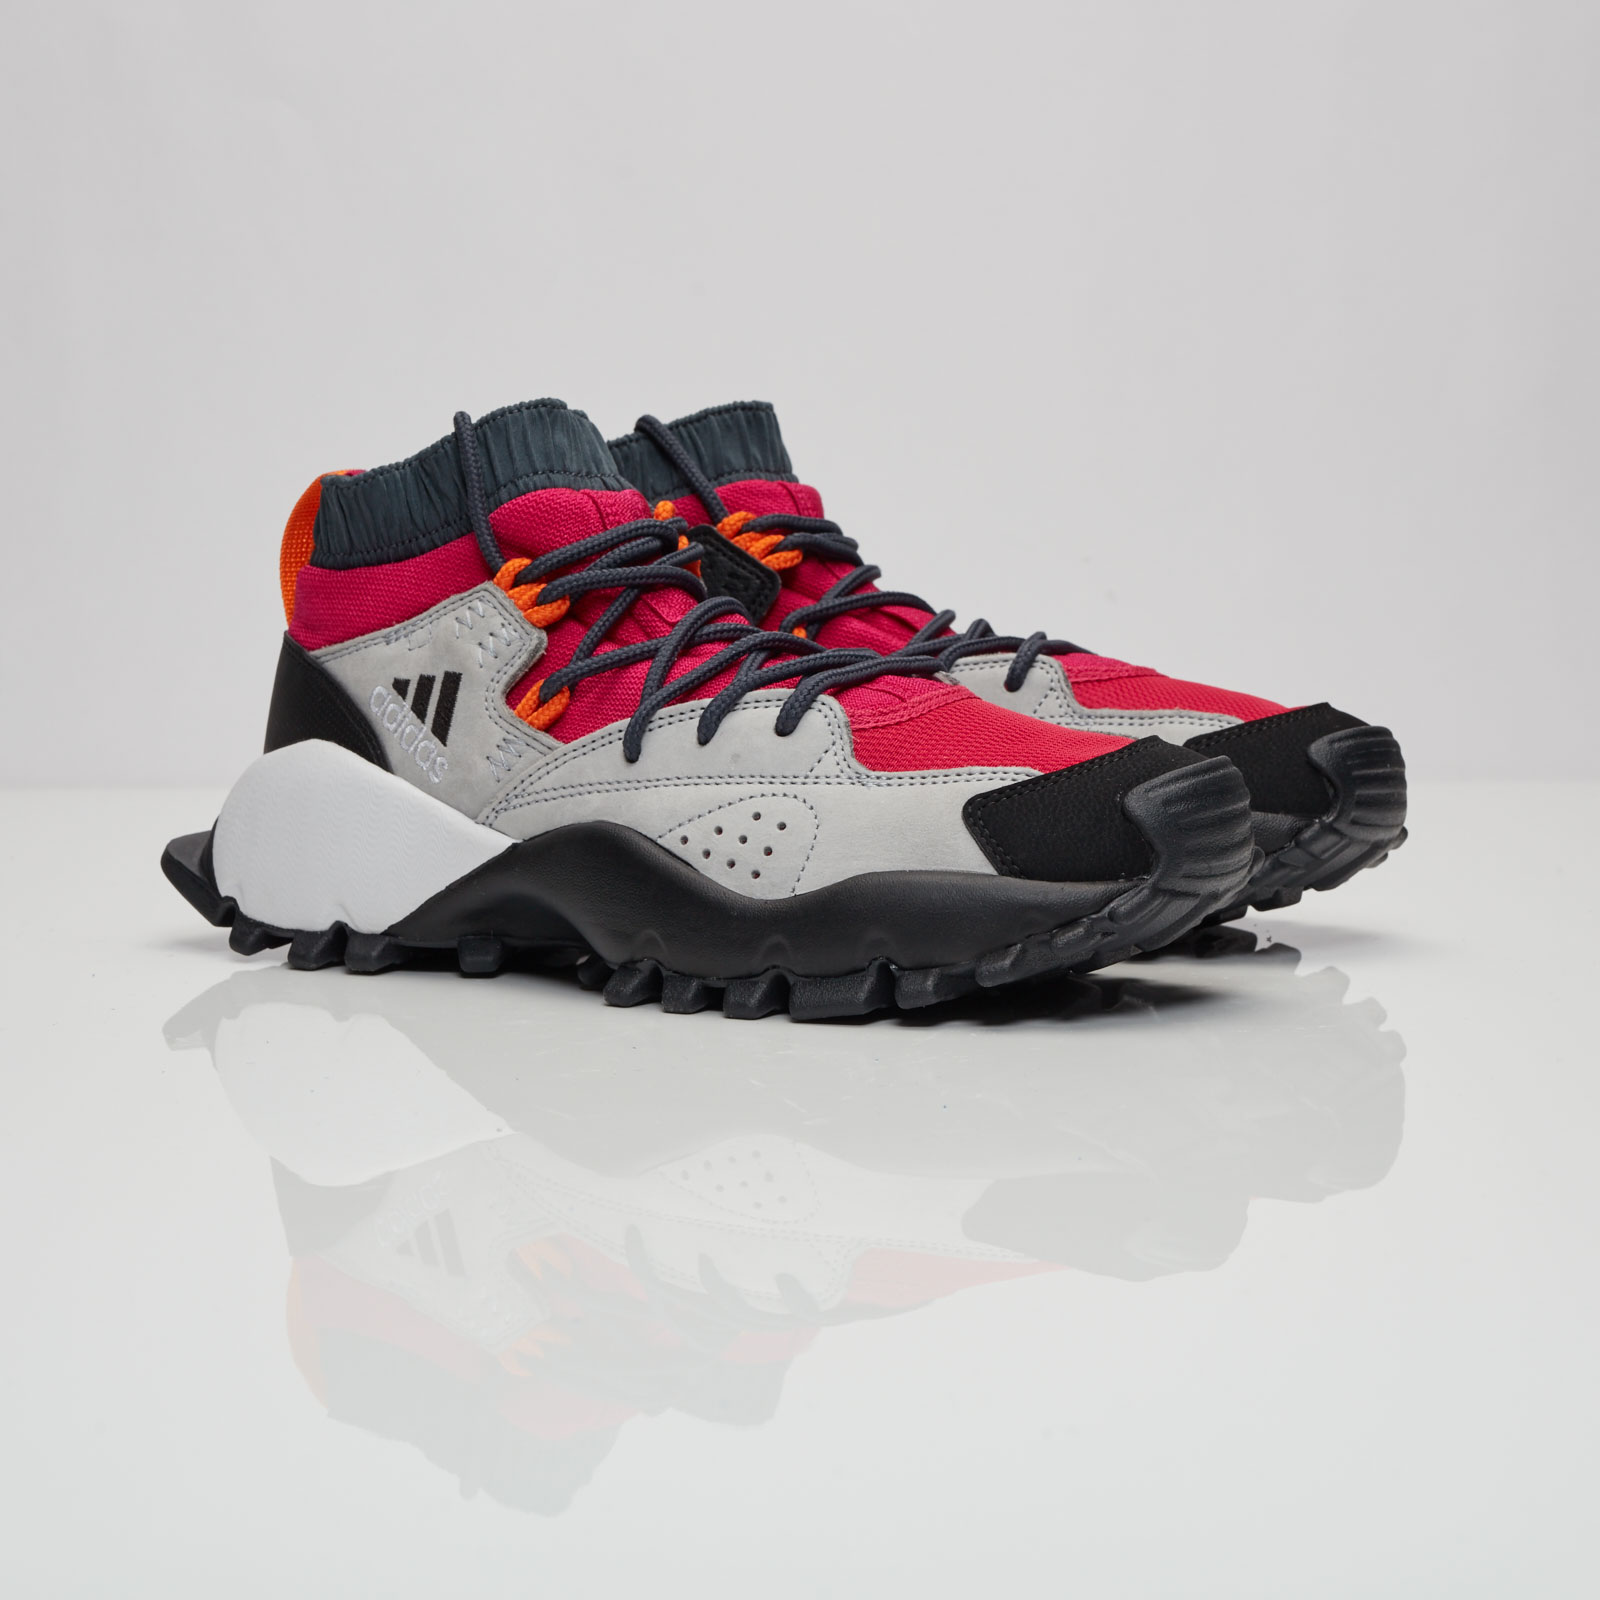 adidas seeulater og s80016 sneakersnstuff scarpe